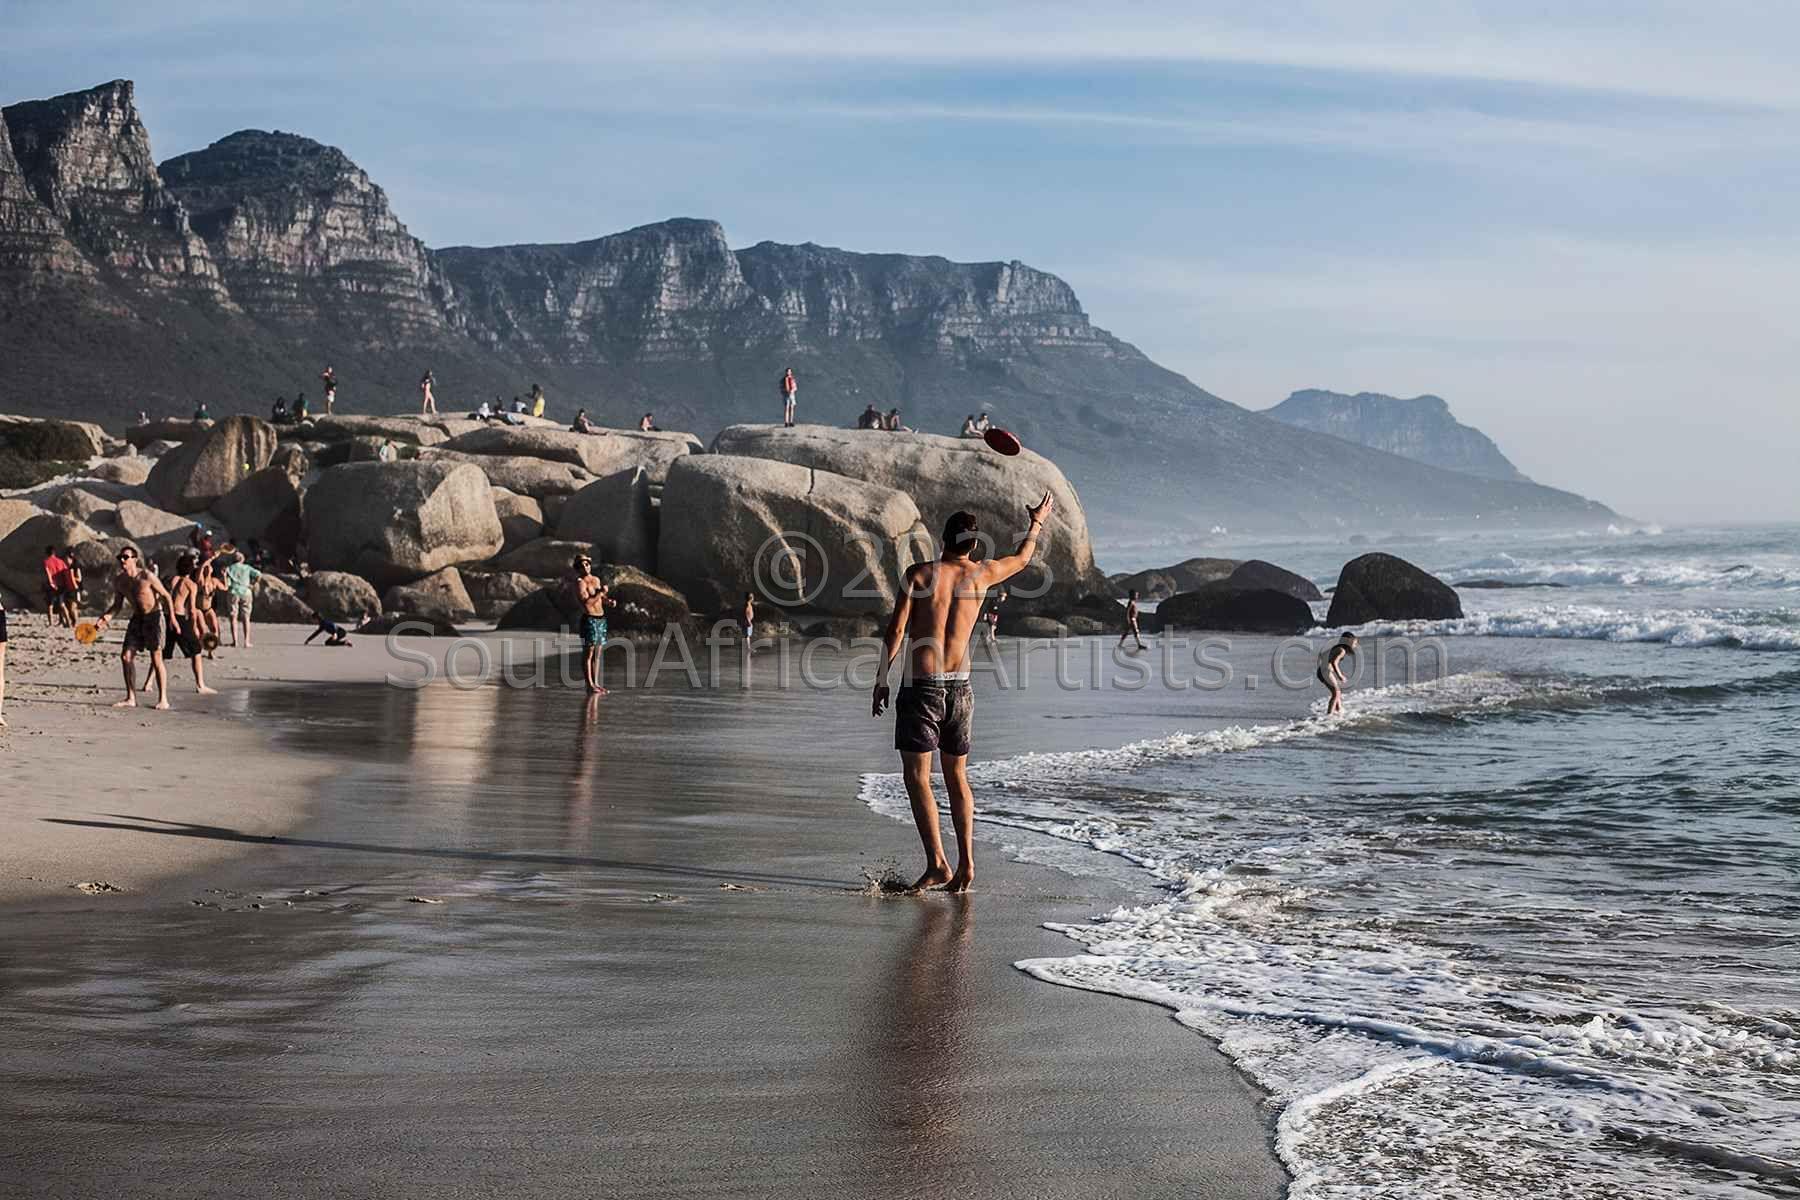 Frisbee Glen Beach, Cape Town